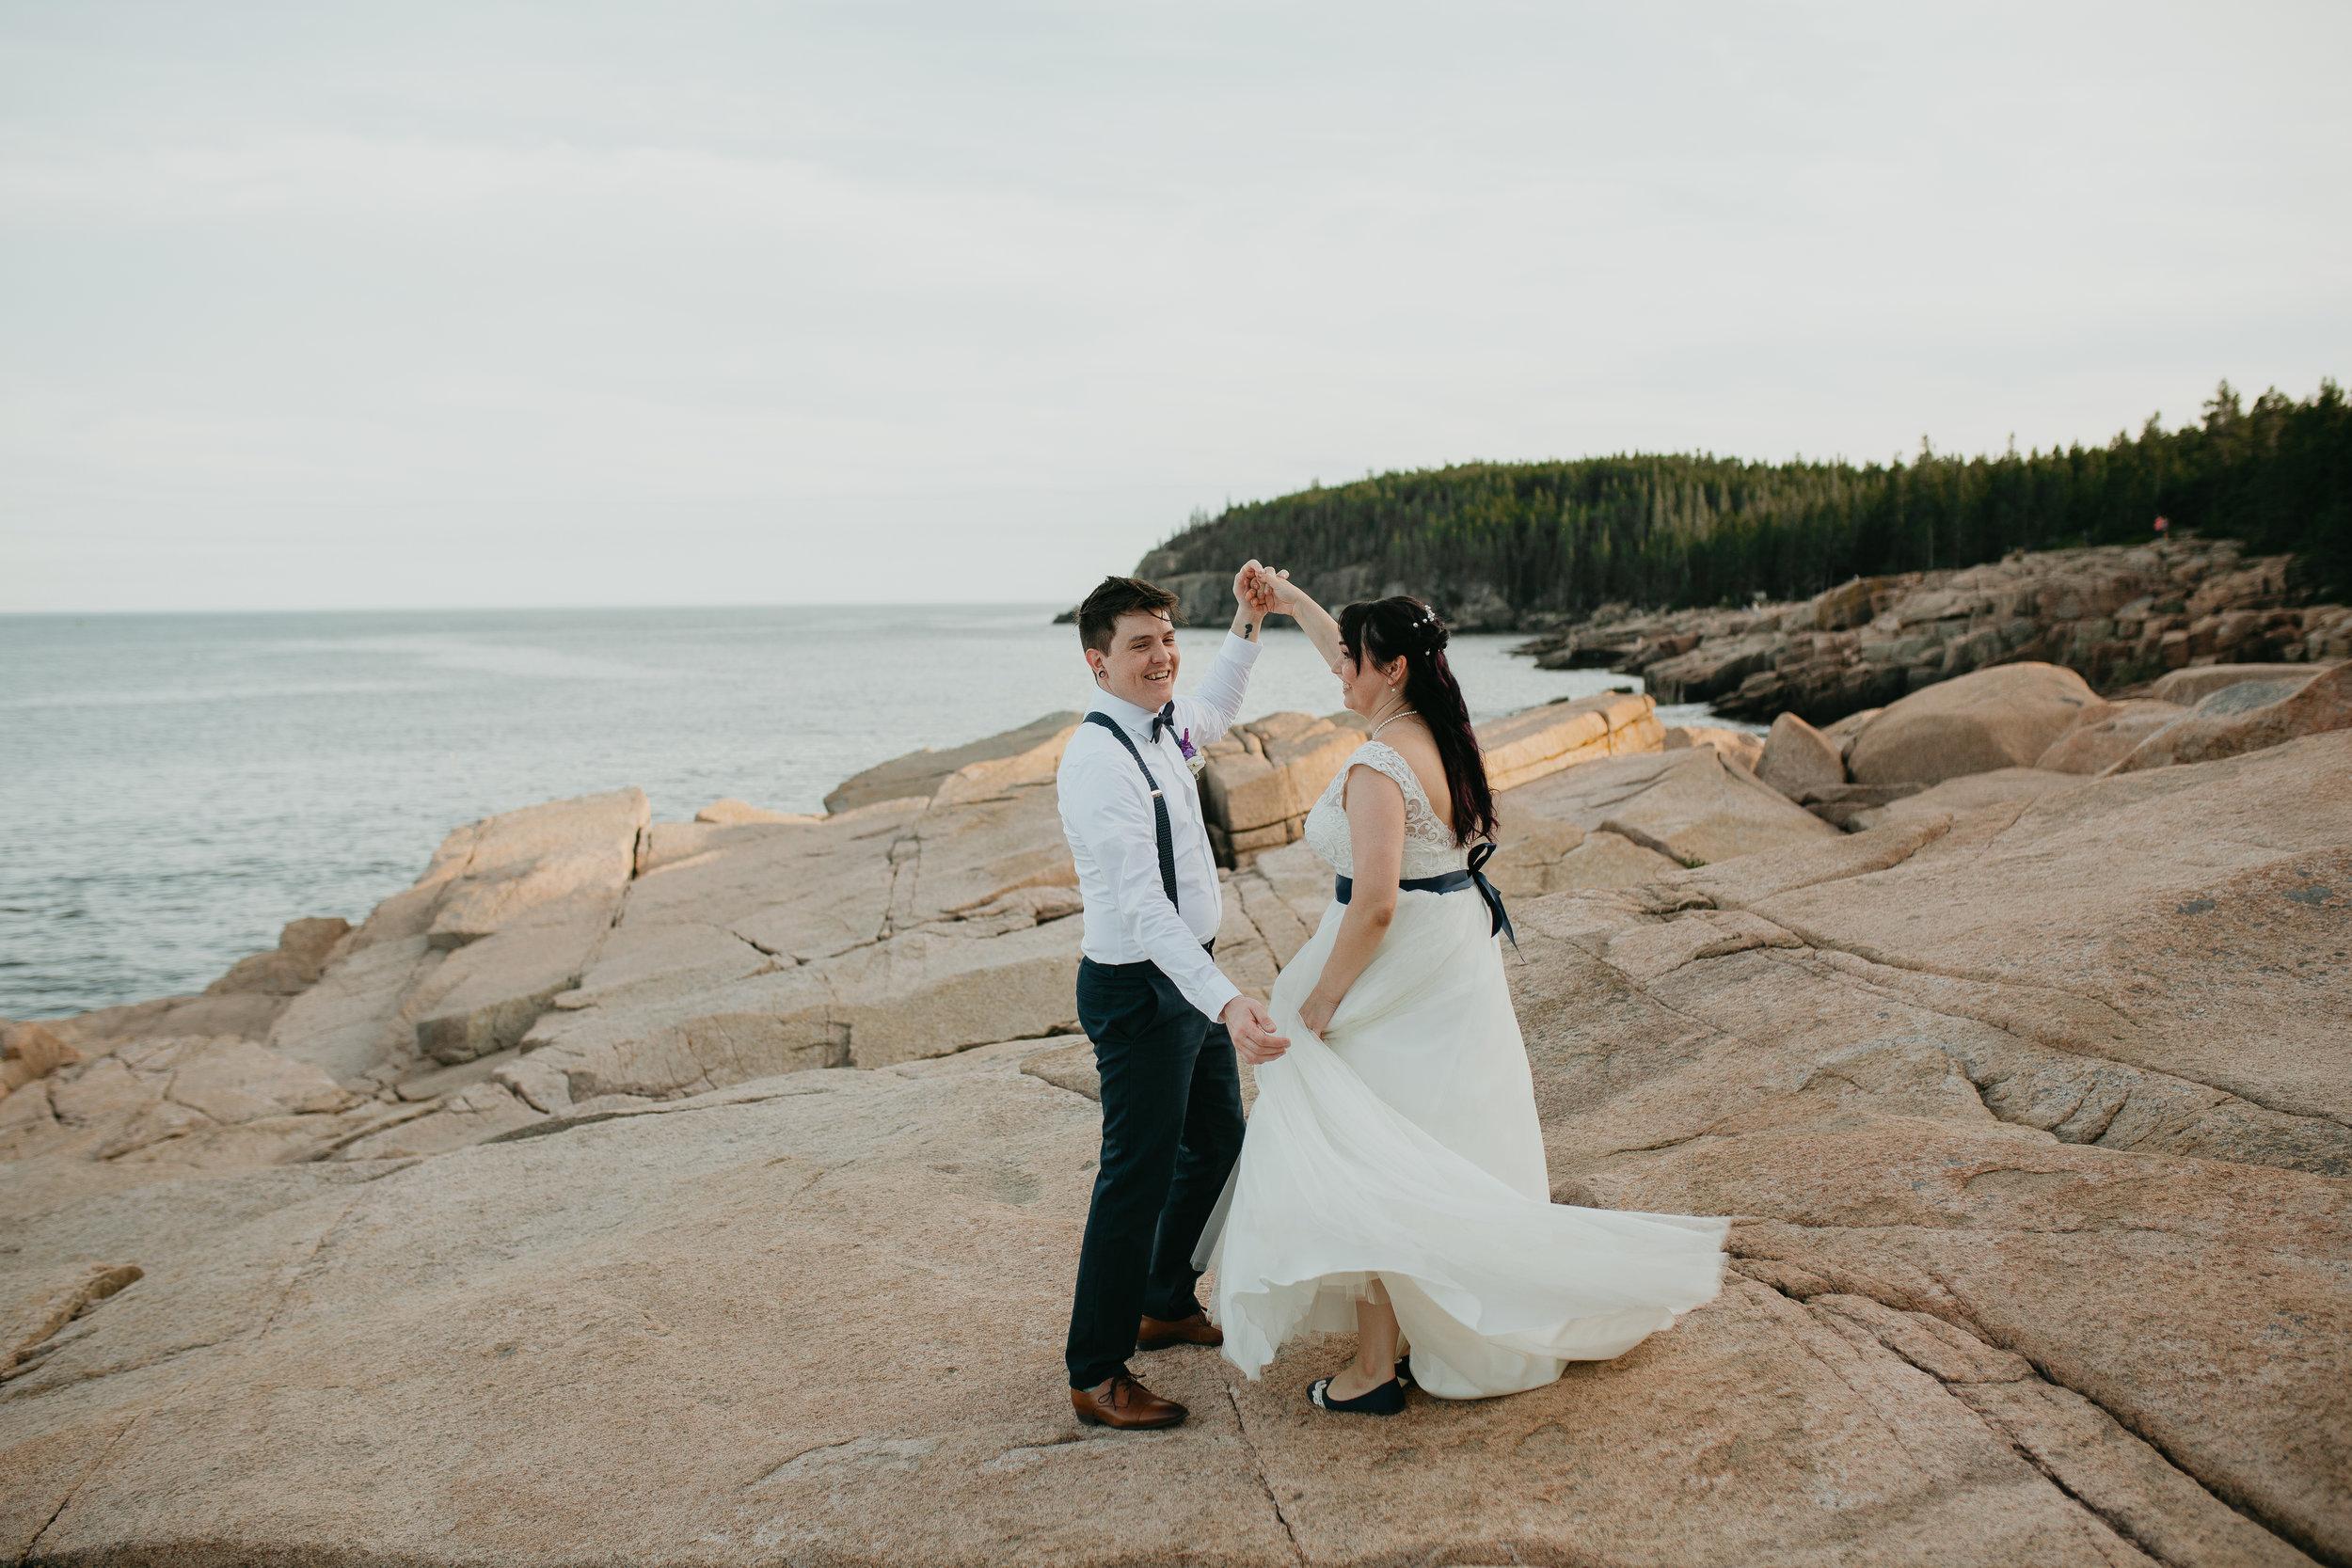 nicole-daacke-photography-Elopement-rocky-shoreline-coast-Acadia-National-Park-elopement-photographer-inspiration-maine-elopement-otter-cliffs-schoonic-head-point-51.jpg